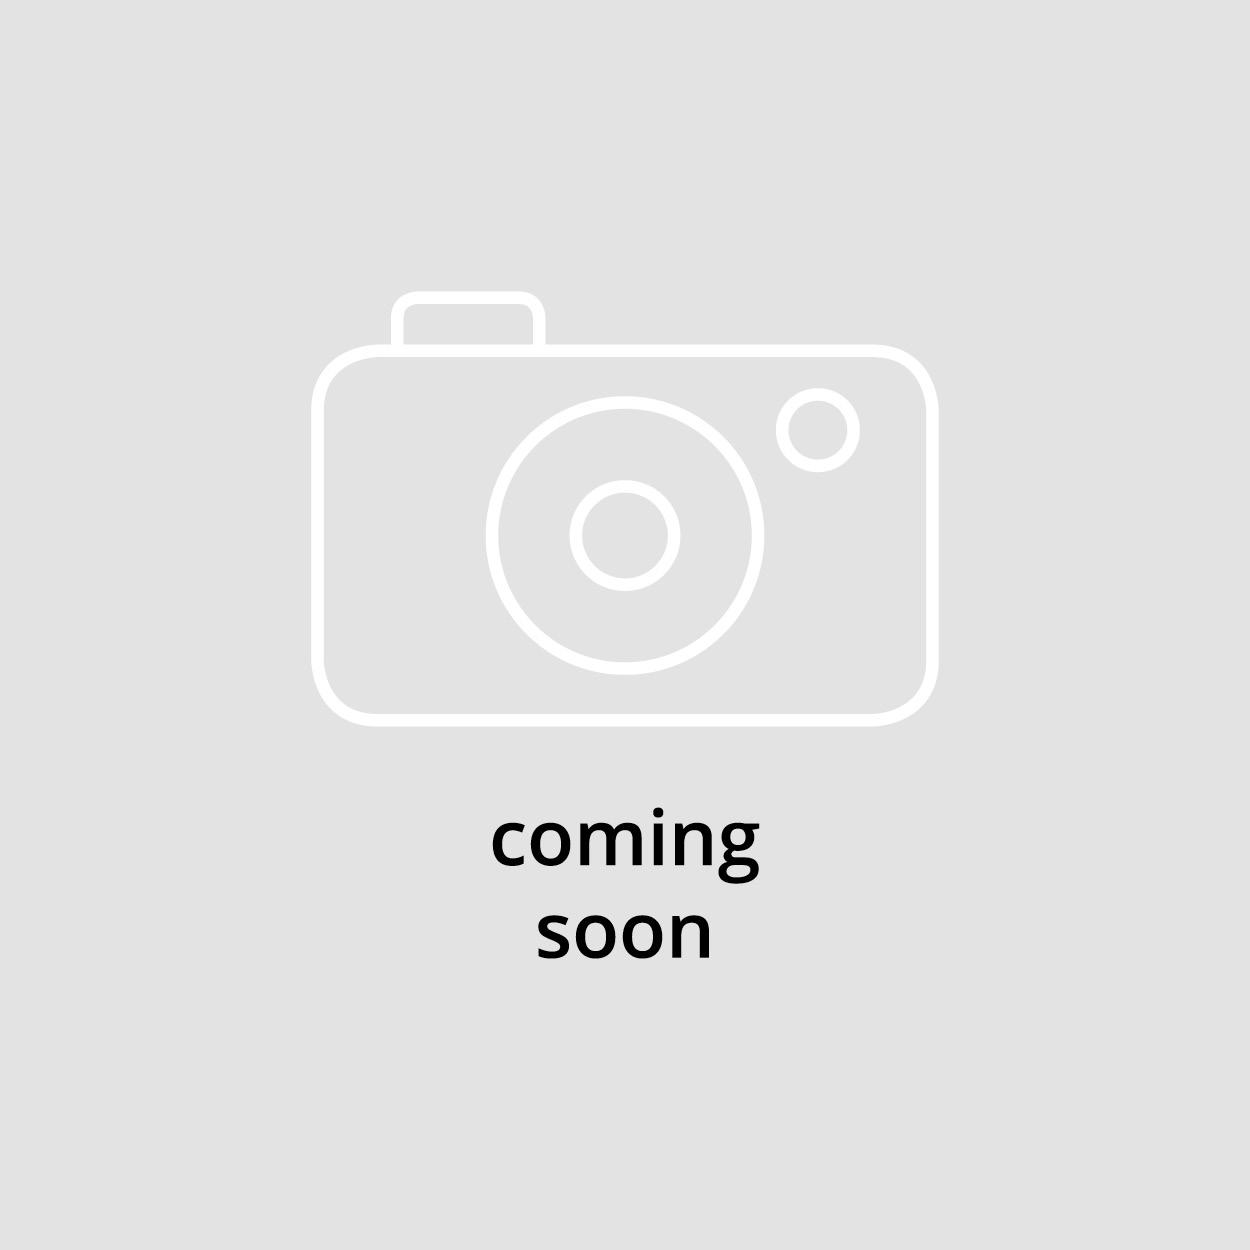 880600 Torretta stretta per Gildemeister IMIS08, AS16, AS20, GS20, GM20, GM20AC